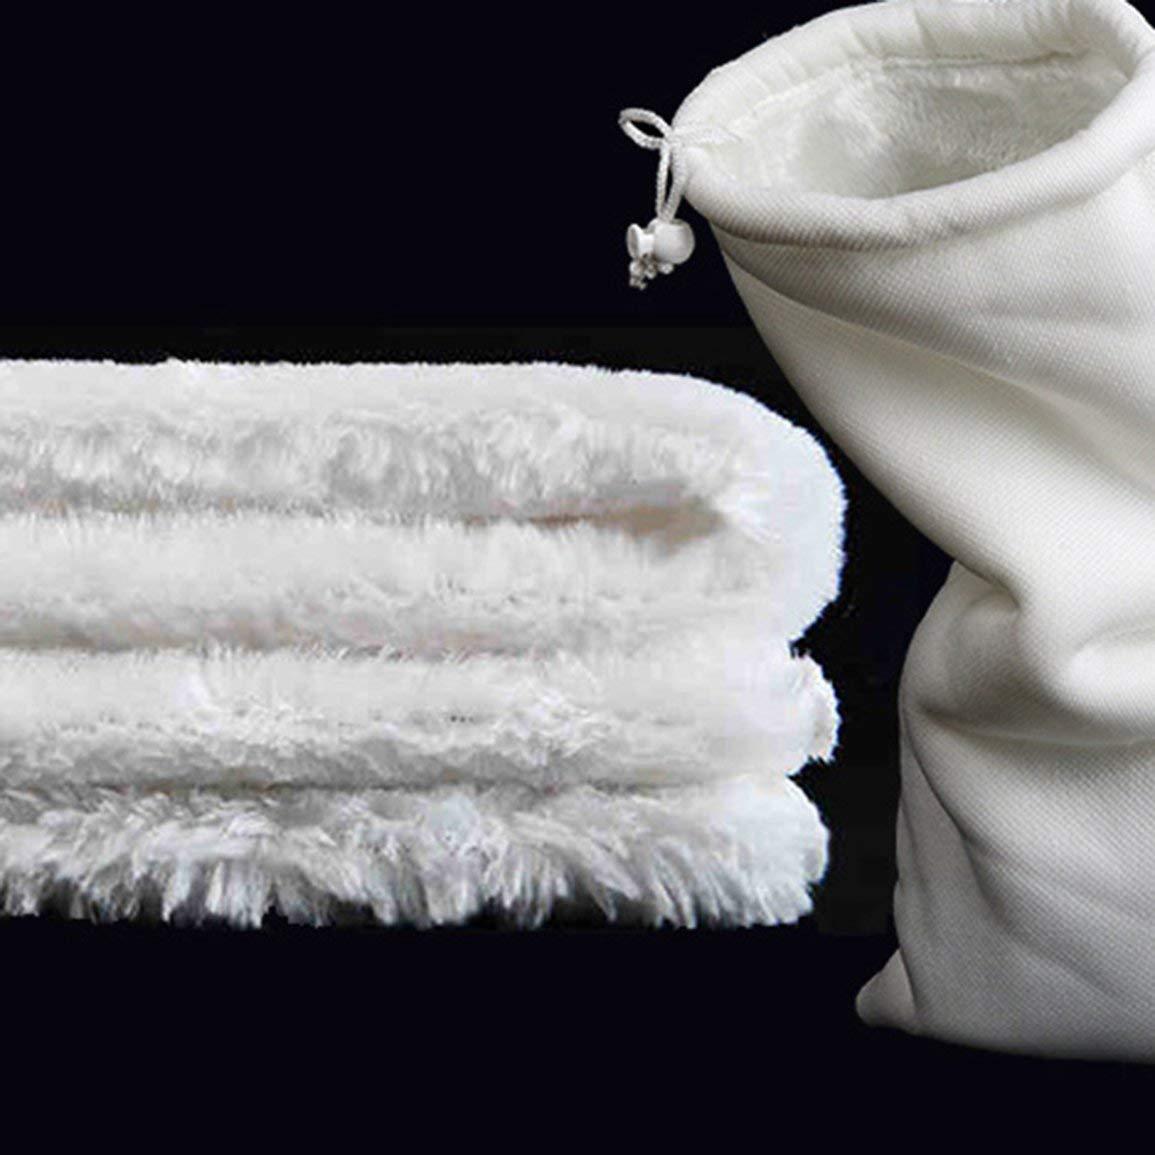 High Efficiency Reusable Aquarium Filter Carpet Fish Tank Pre-Fiber Blanket Filtration Rug Pad Magic Filter Blanket